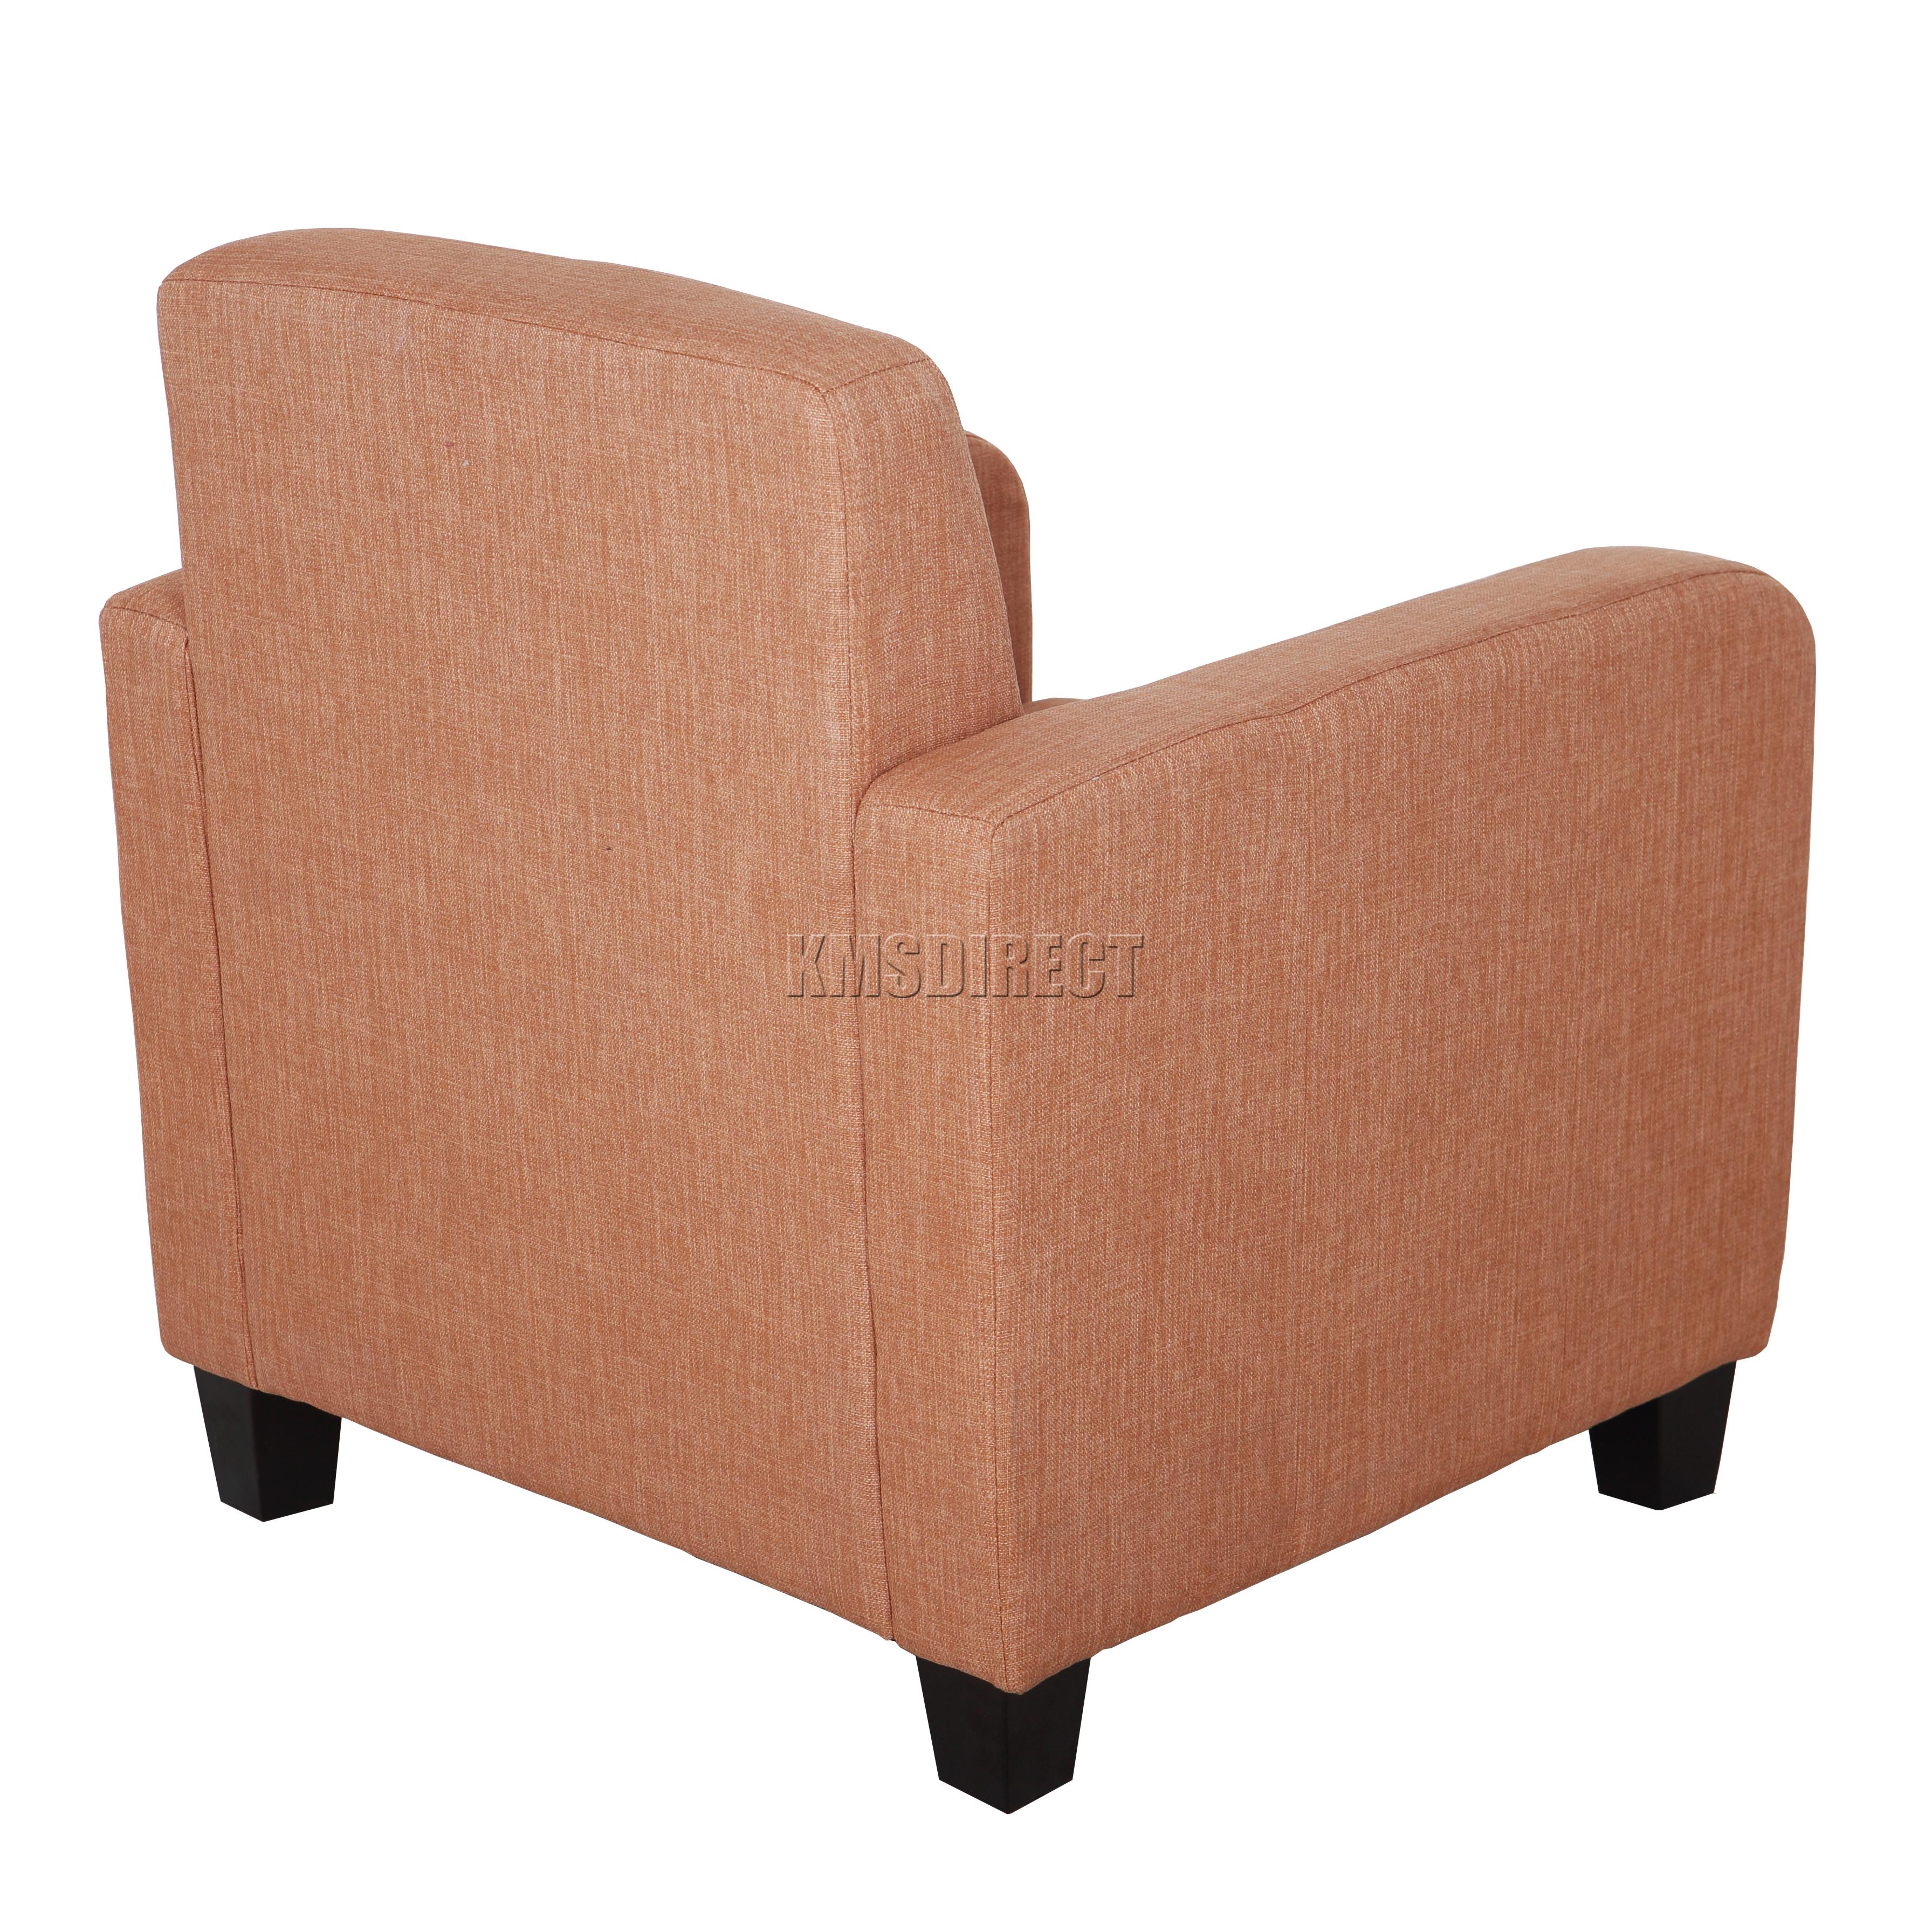 living room lounge chair  eBay